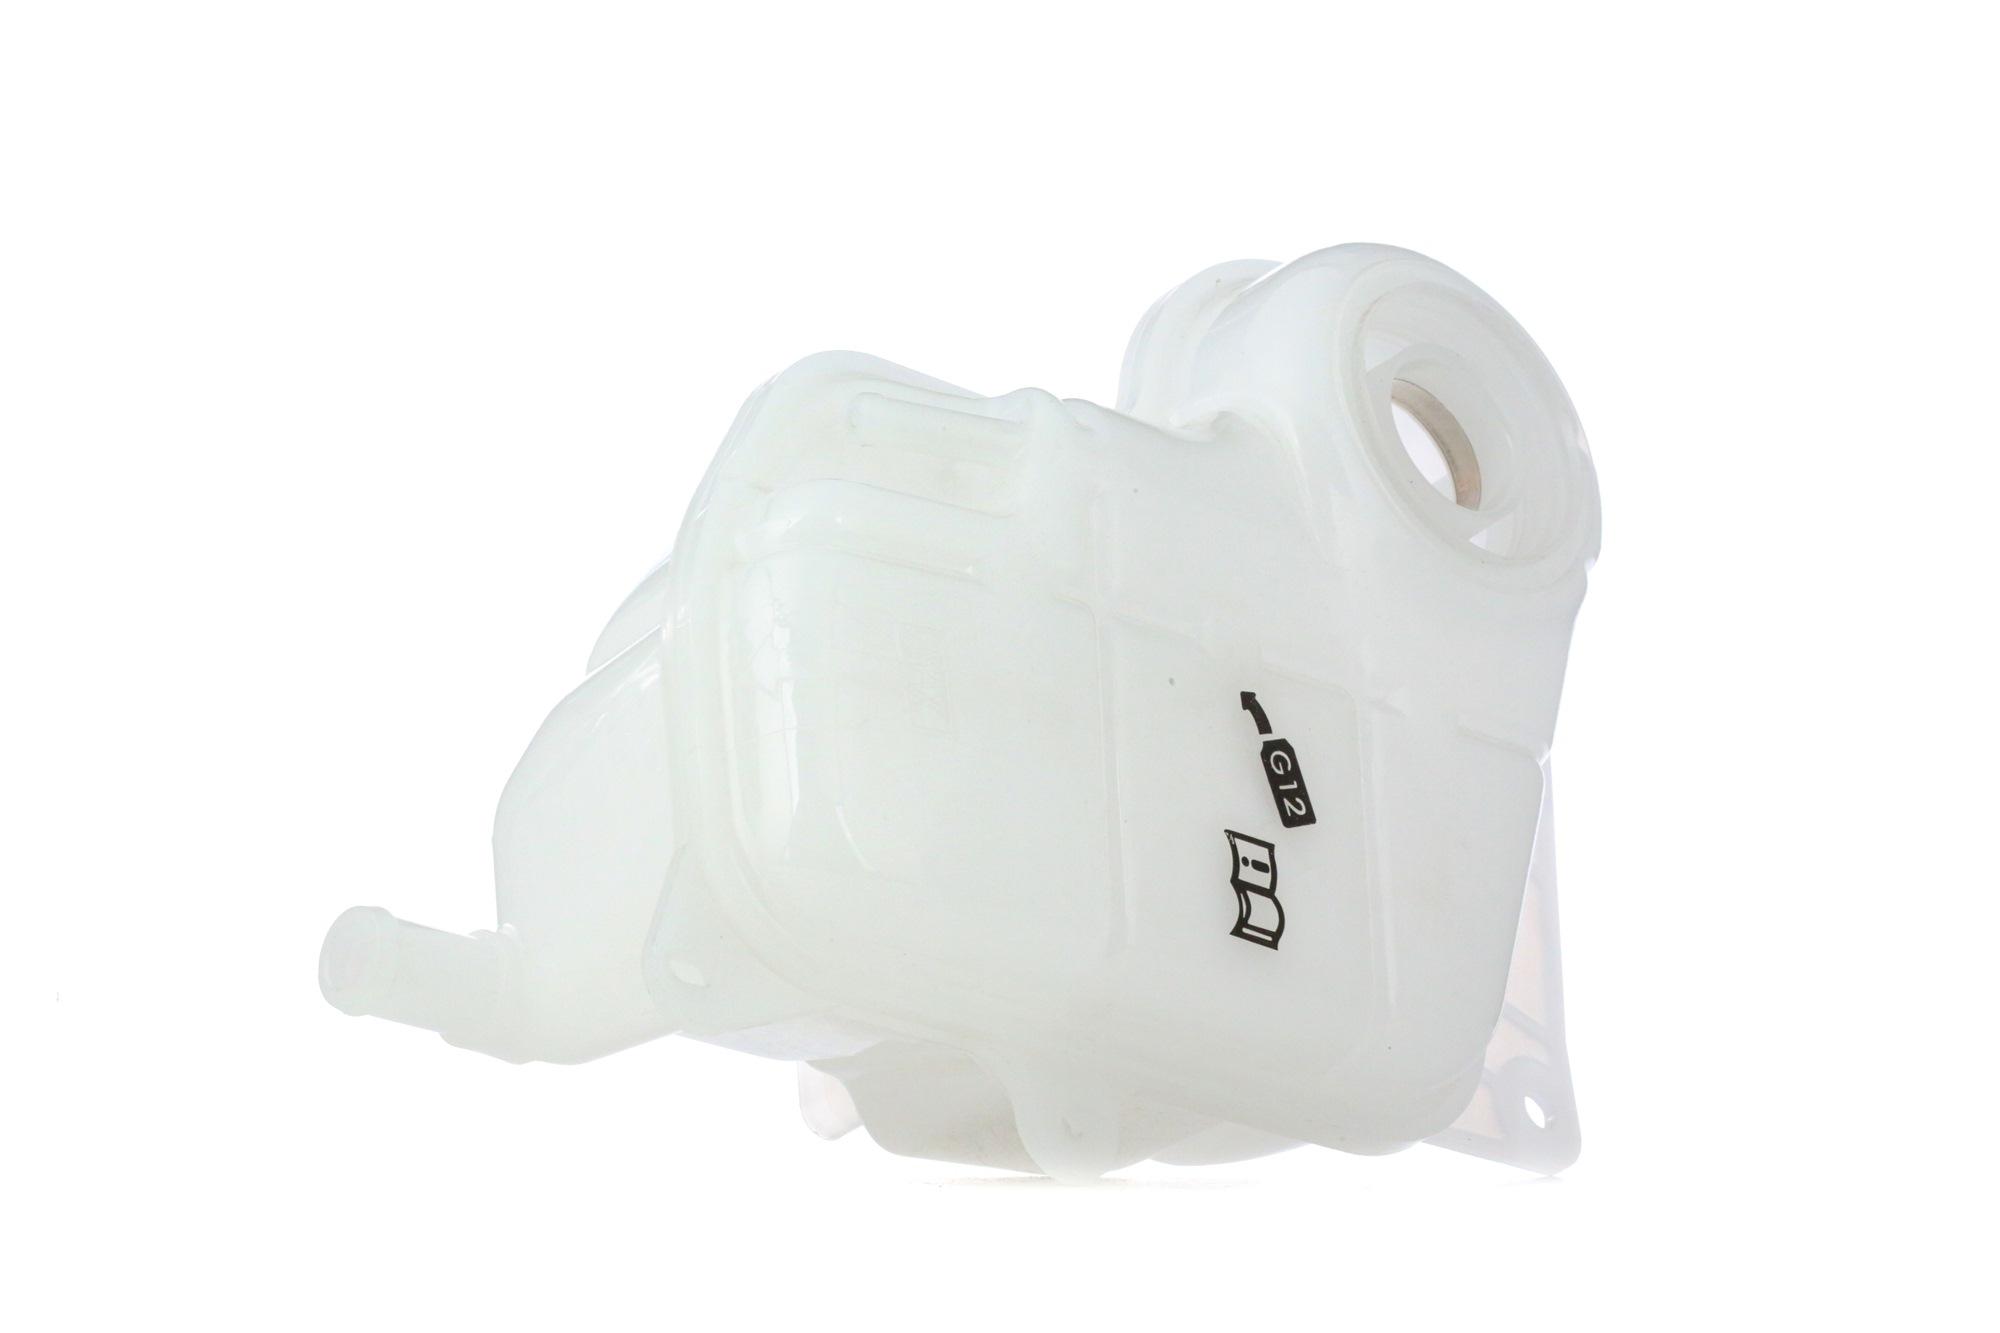 AUDI A6 2018 Kühlwasserbehälter - Original RIDEX 397E0011